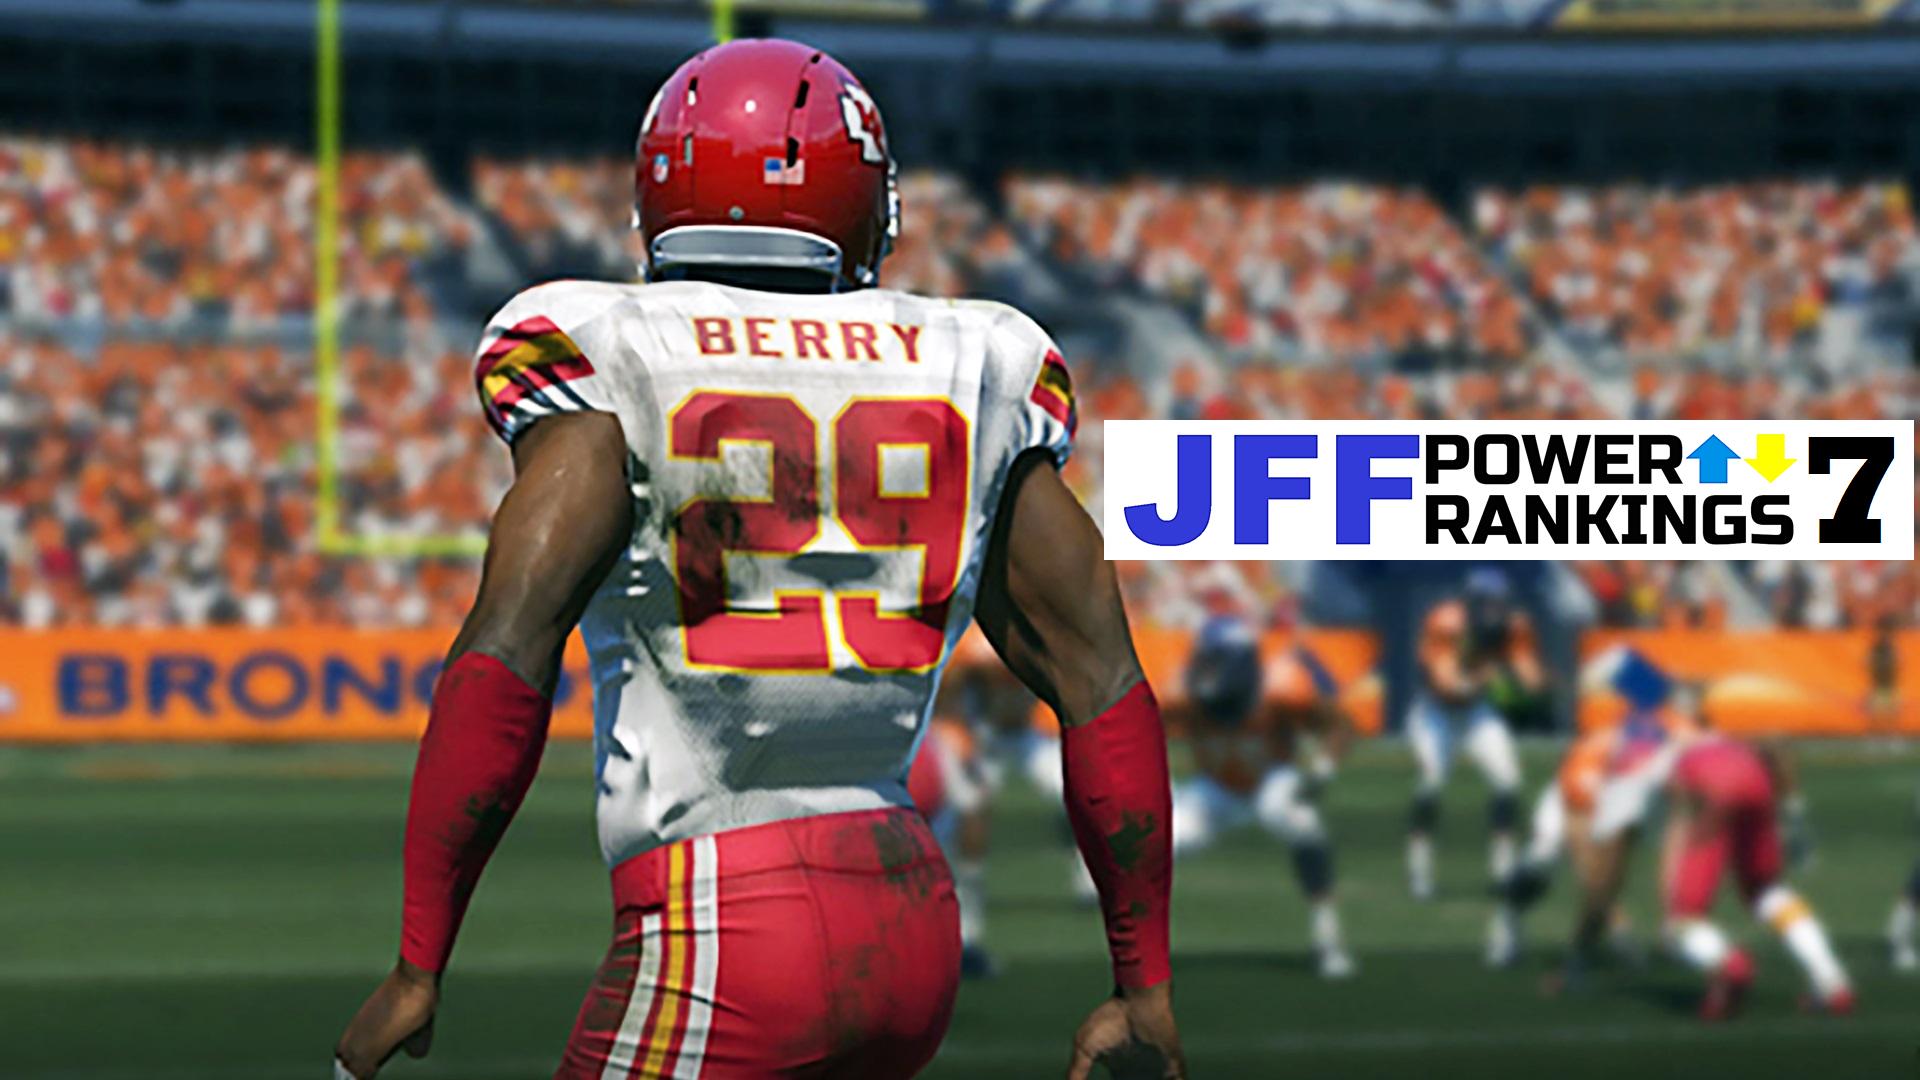 JFF Power Rankings - Installment #7